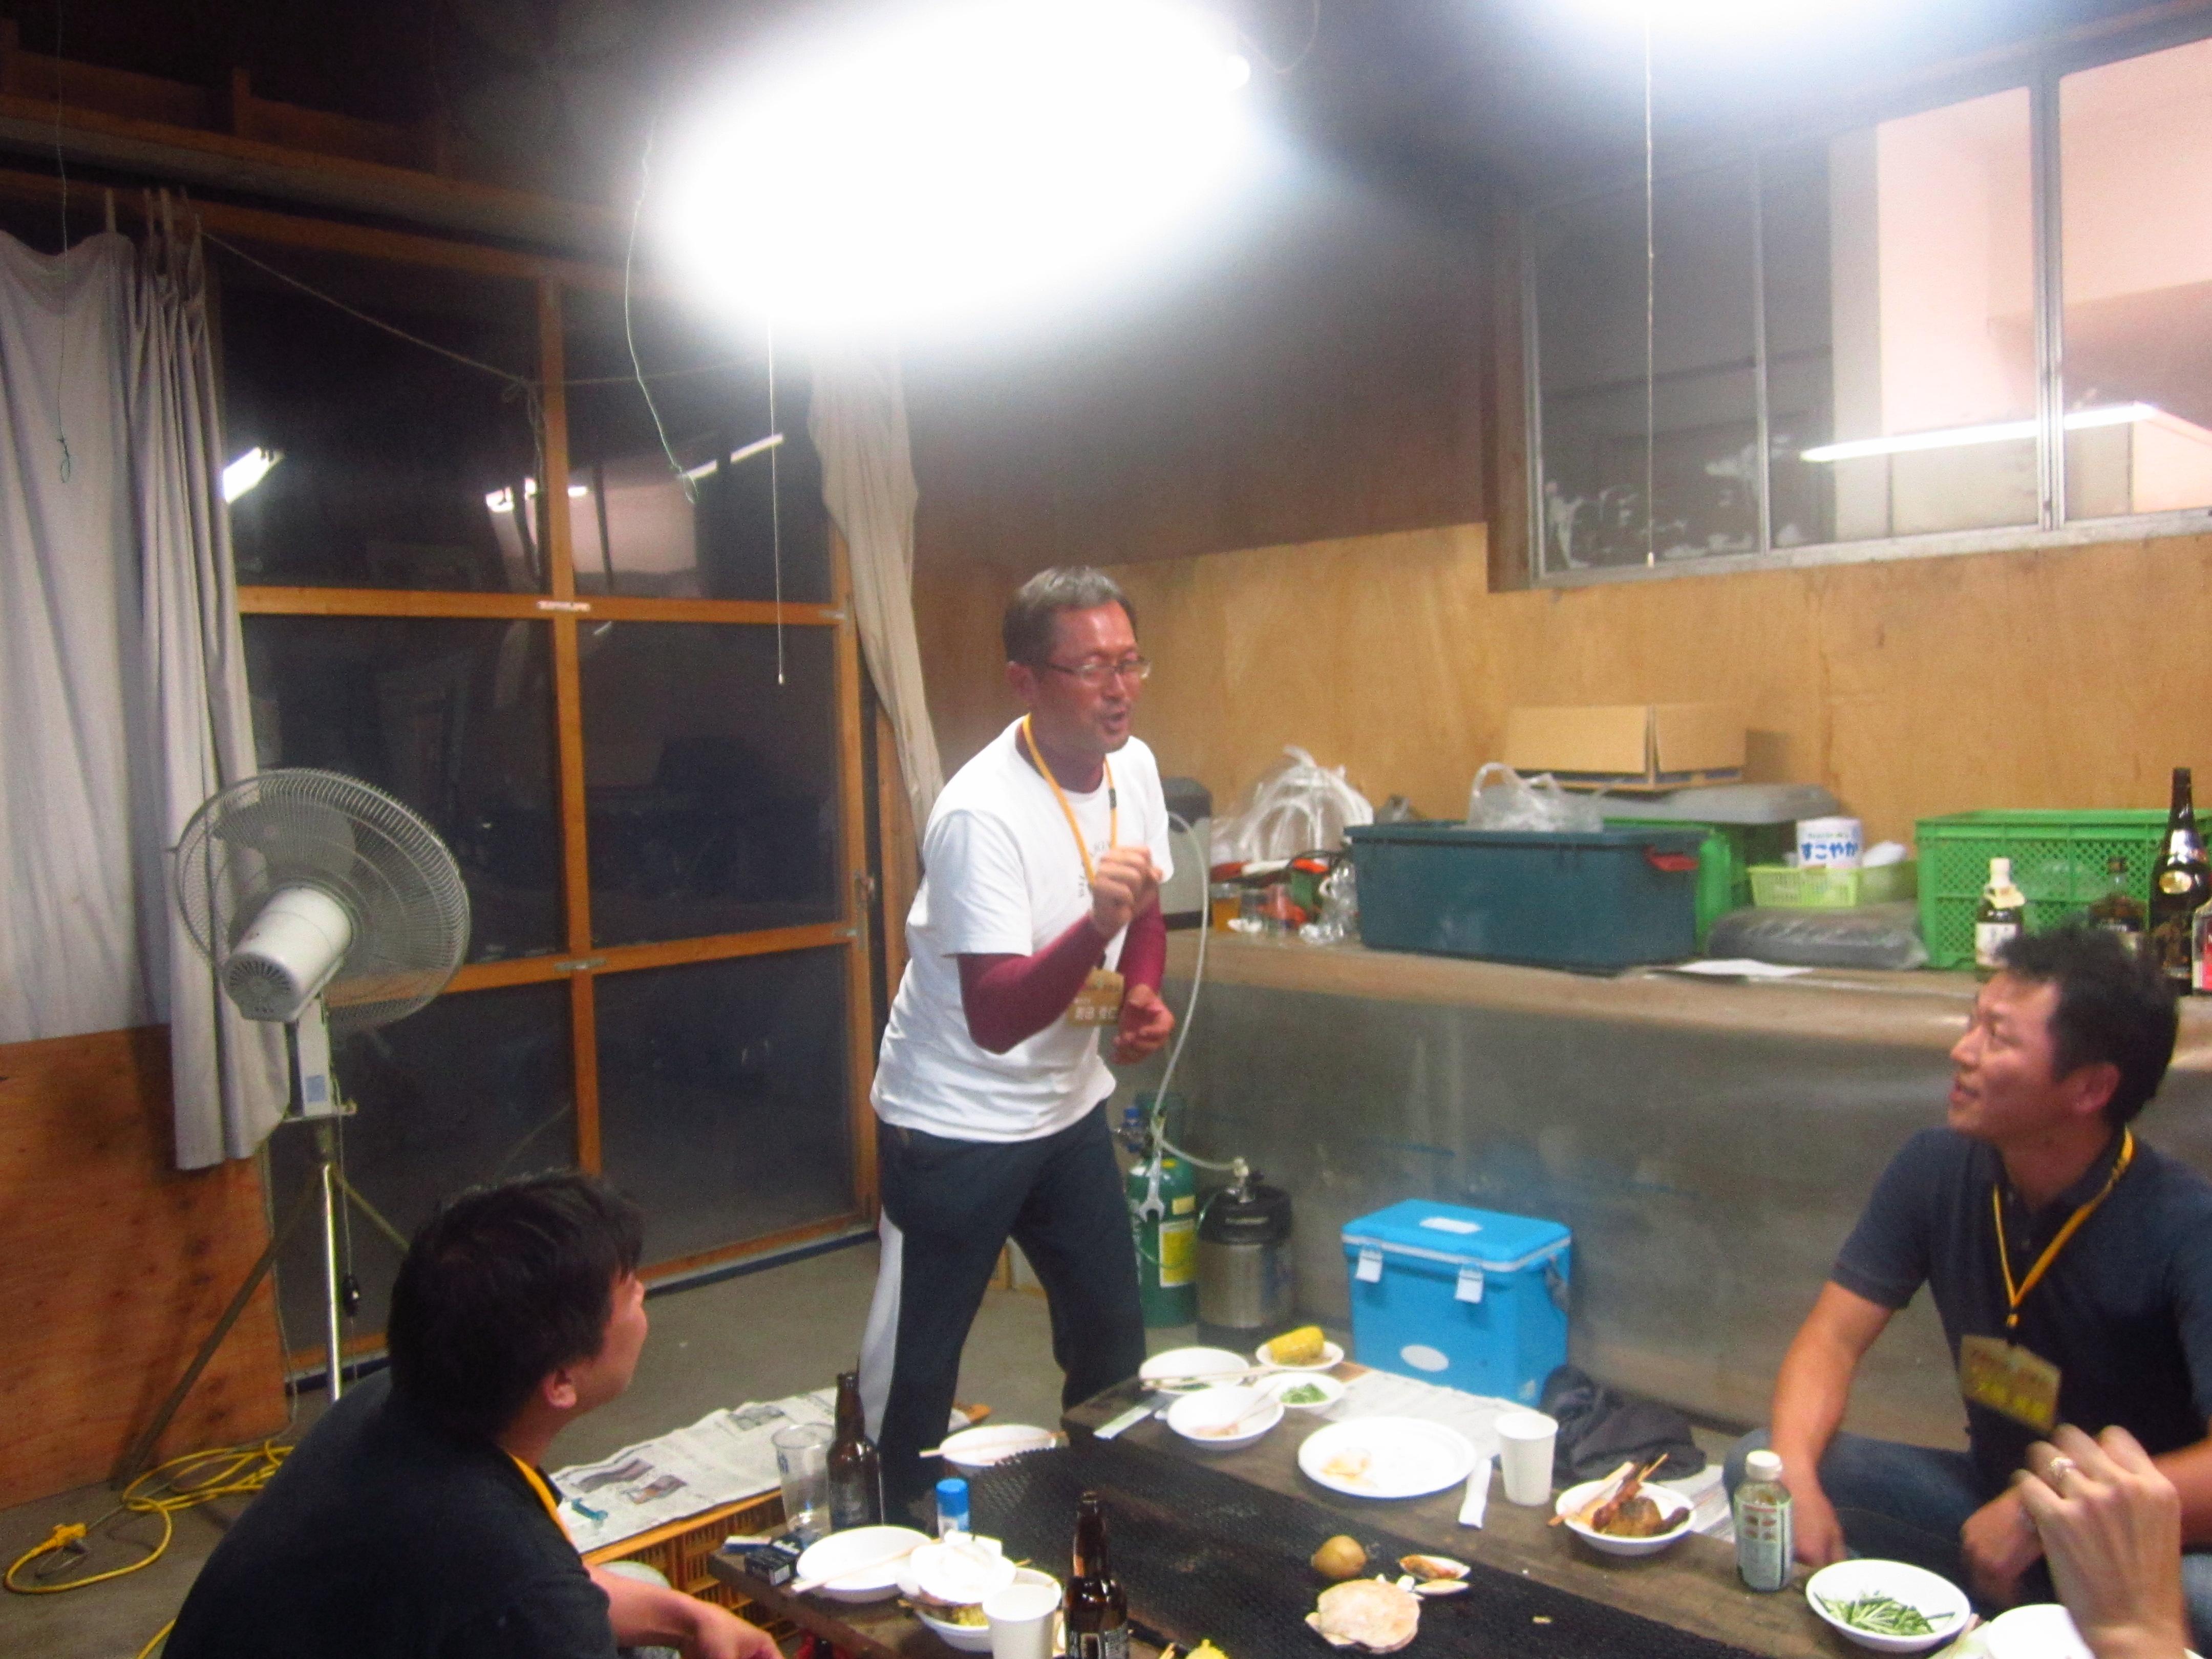 IMG 4379 - 麻布十番納涼祭り25,26日(七戸町出店)